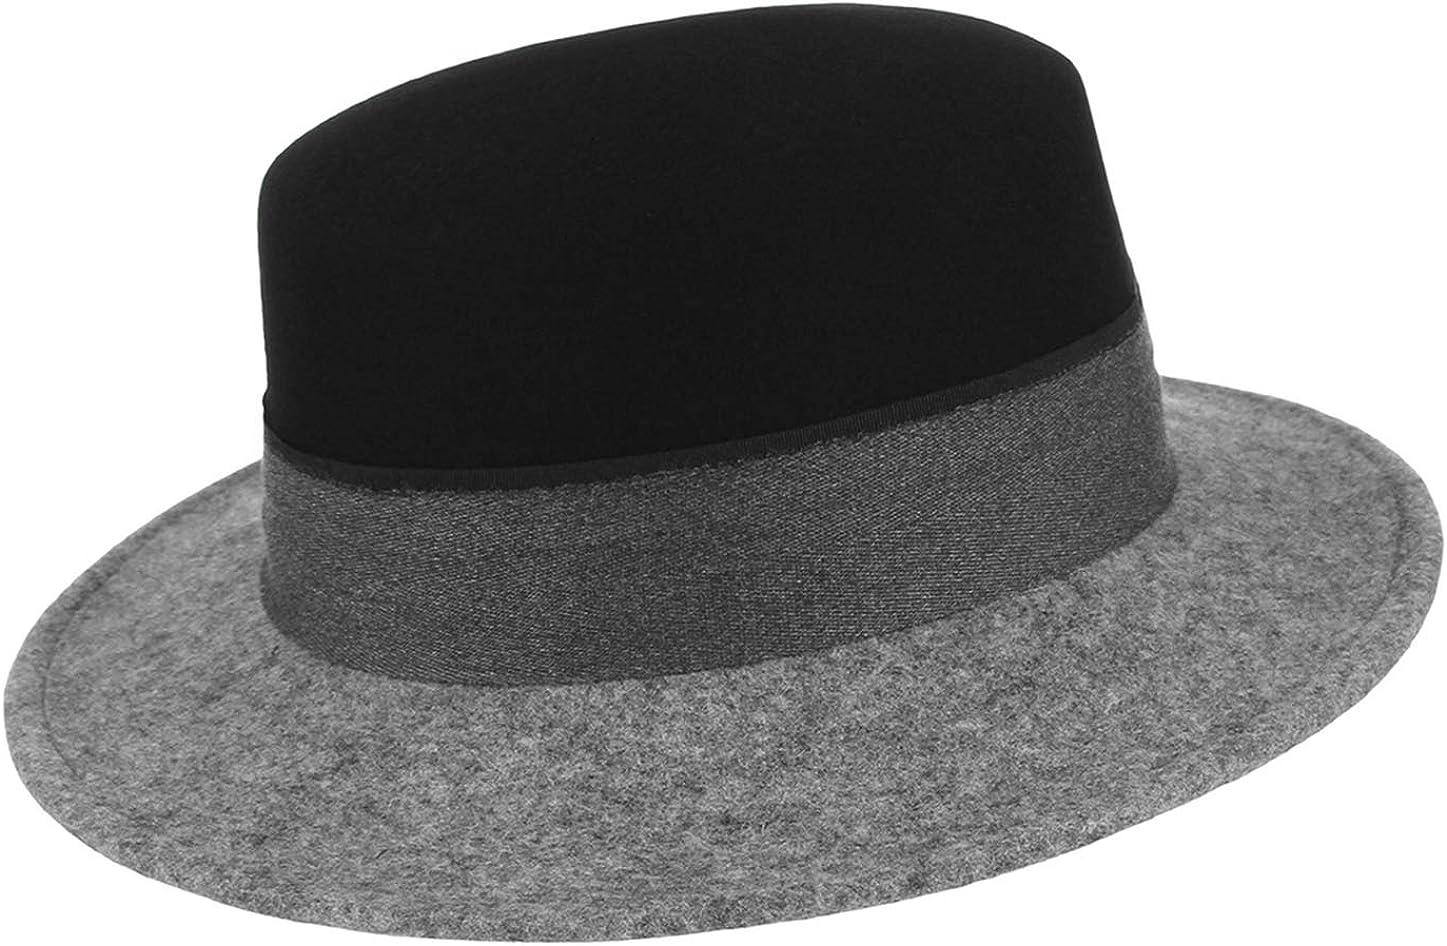 GEMVIE 100% Wool Flat Top Fedora Hat Mens Womens Vintage Gradient Color Wool Boater Hat with Band Black